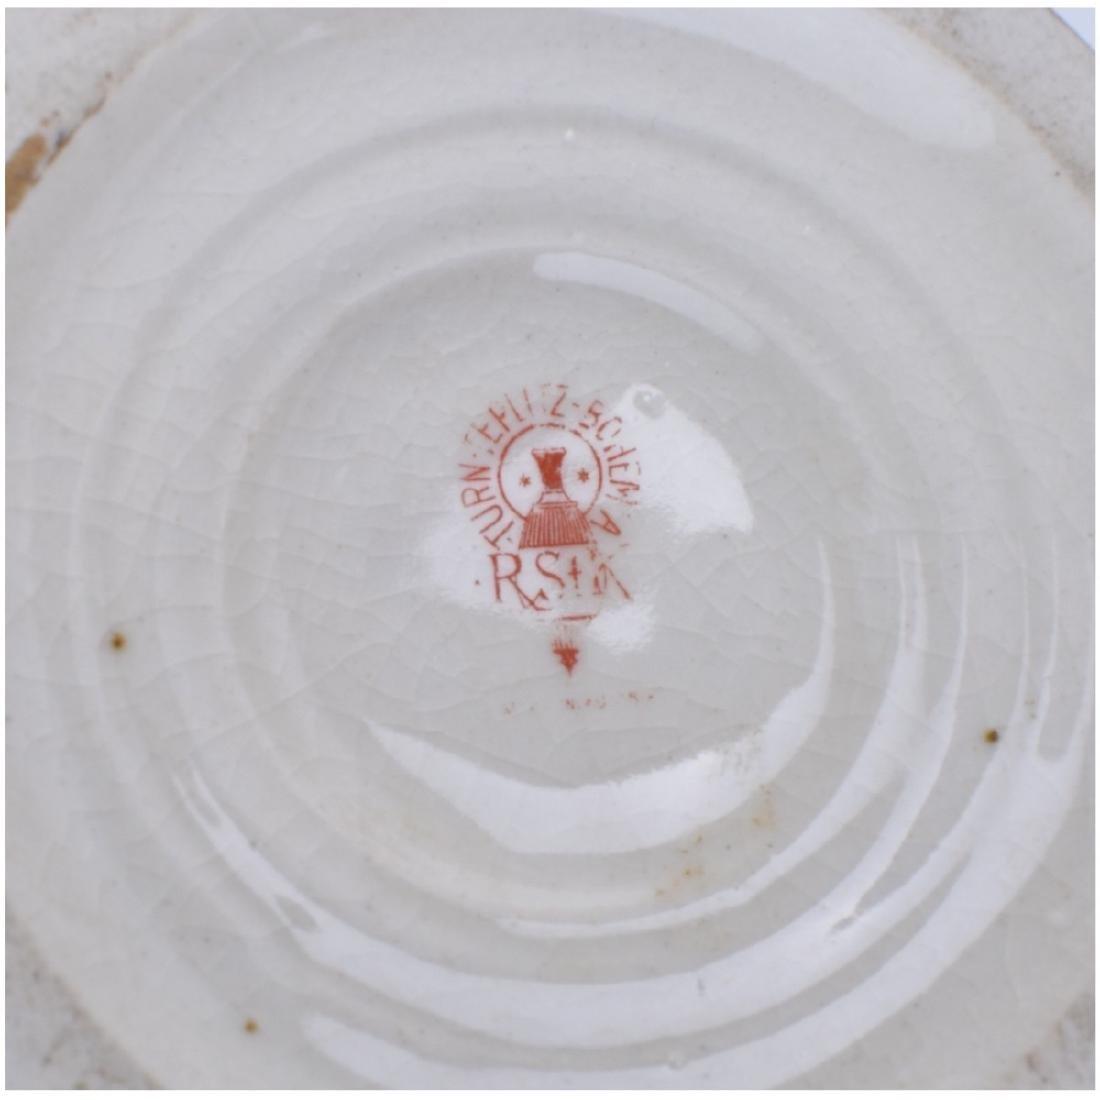 Turn Teplitz Amphora Dolphin Vase - 6